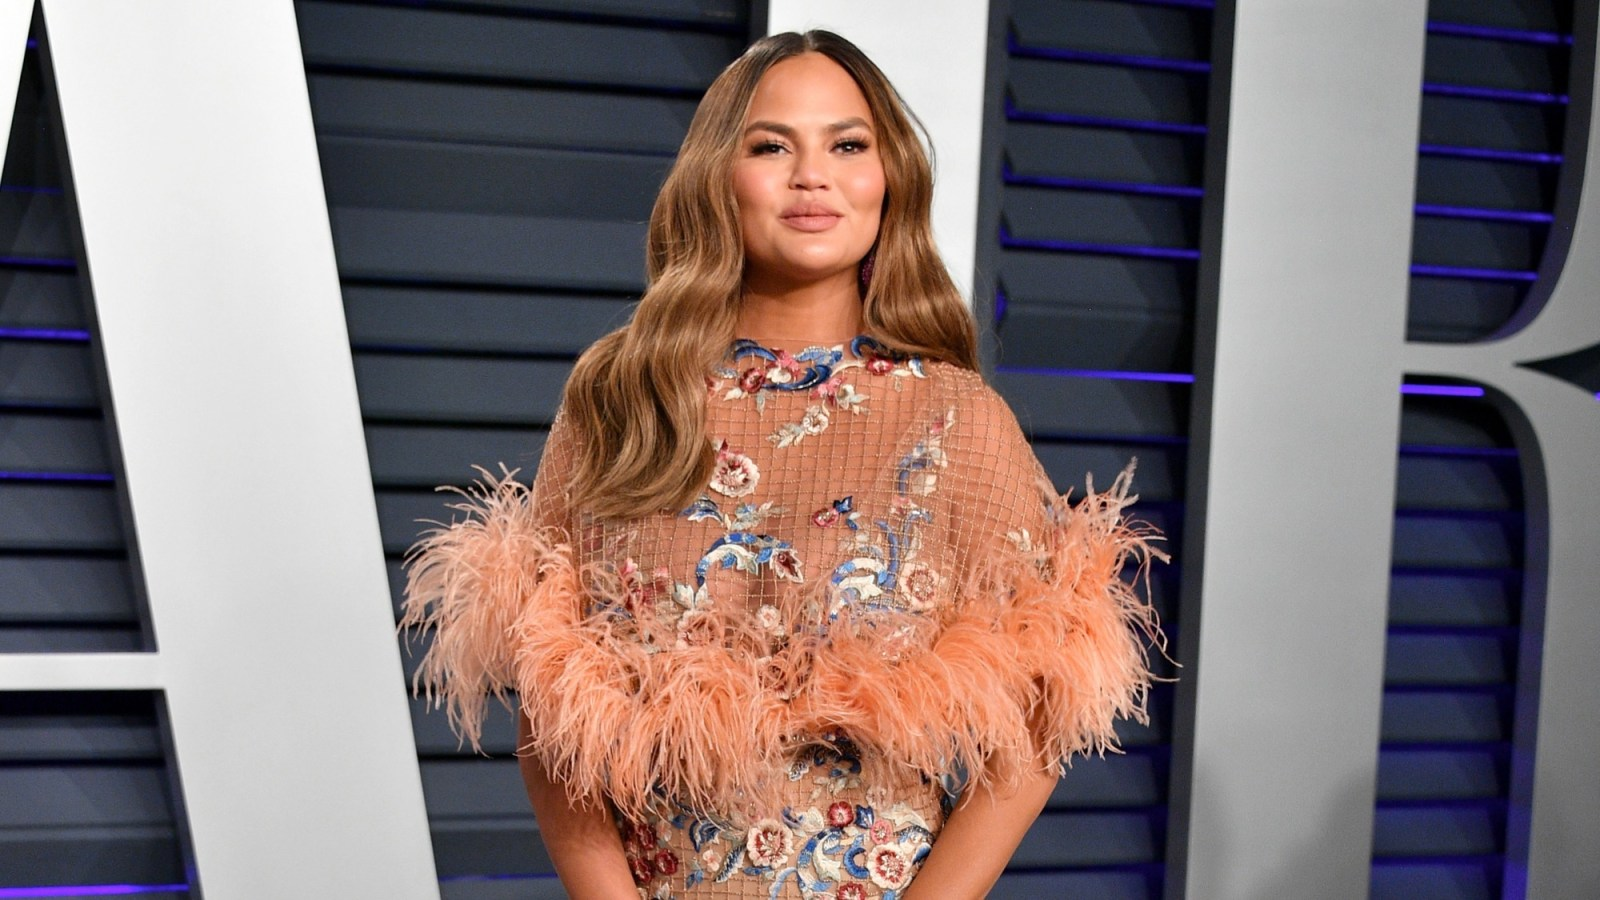 Chrissy Teigen 2019 Vanity Fair Oscar Party Hosted By Radhika Jones - Arrivals